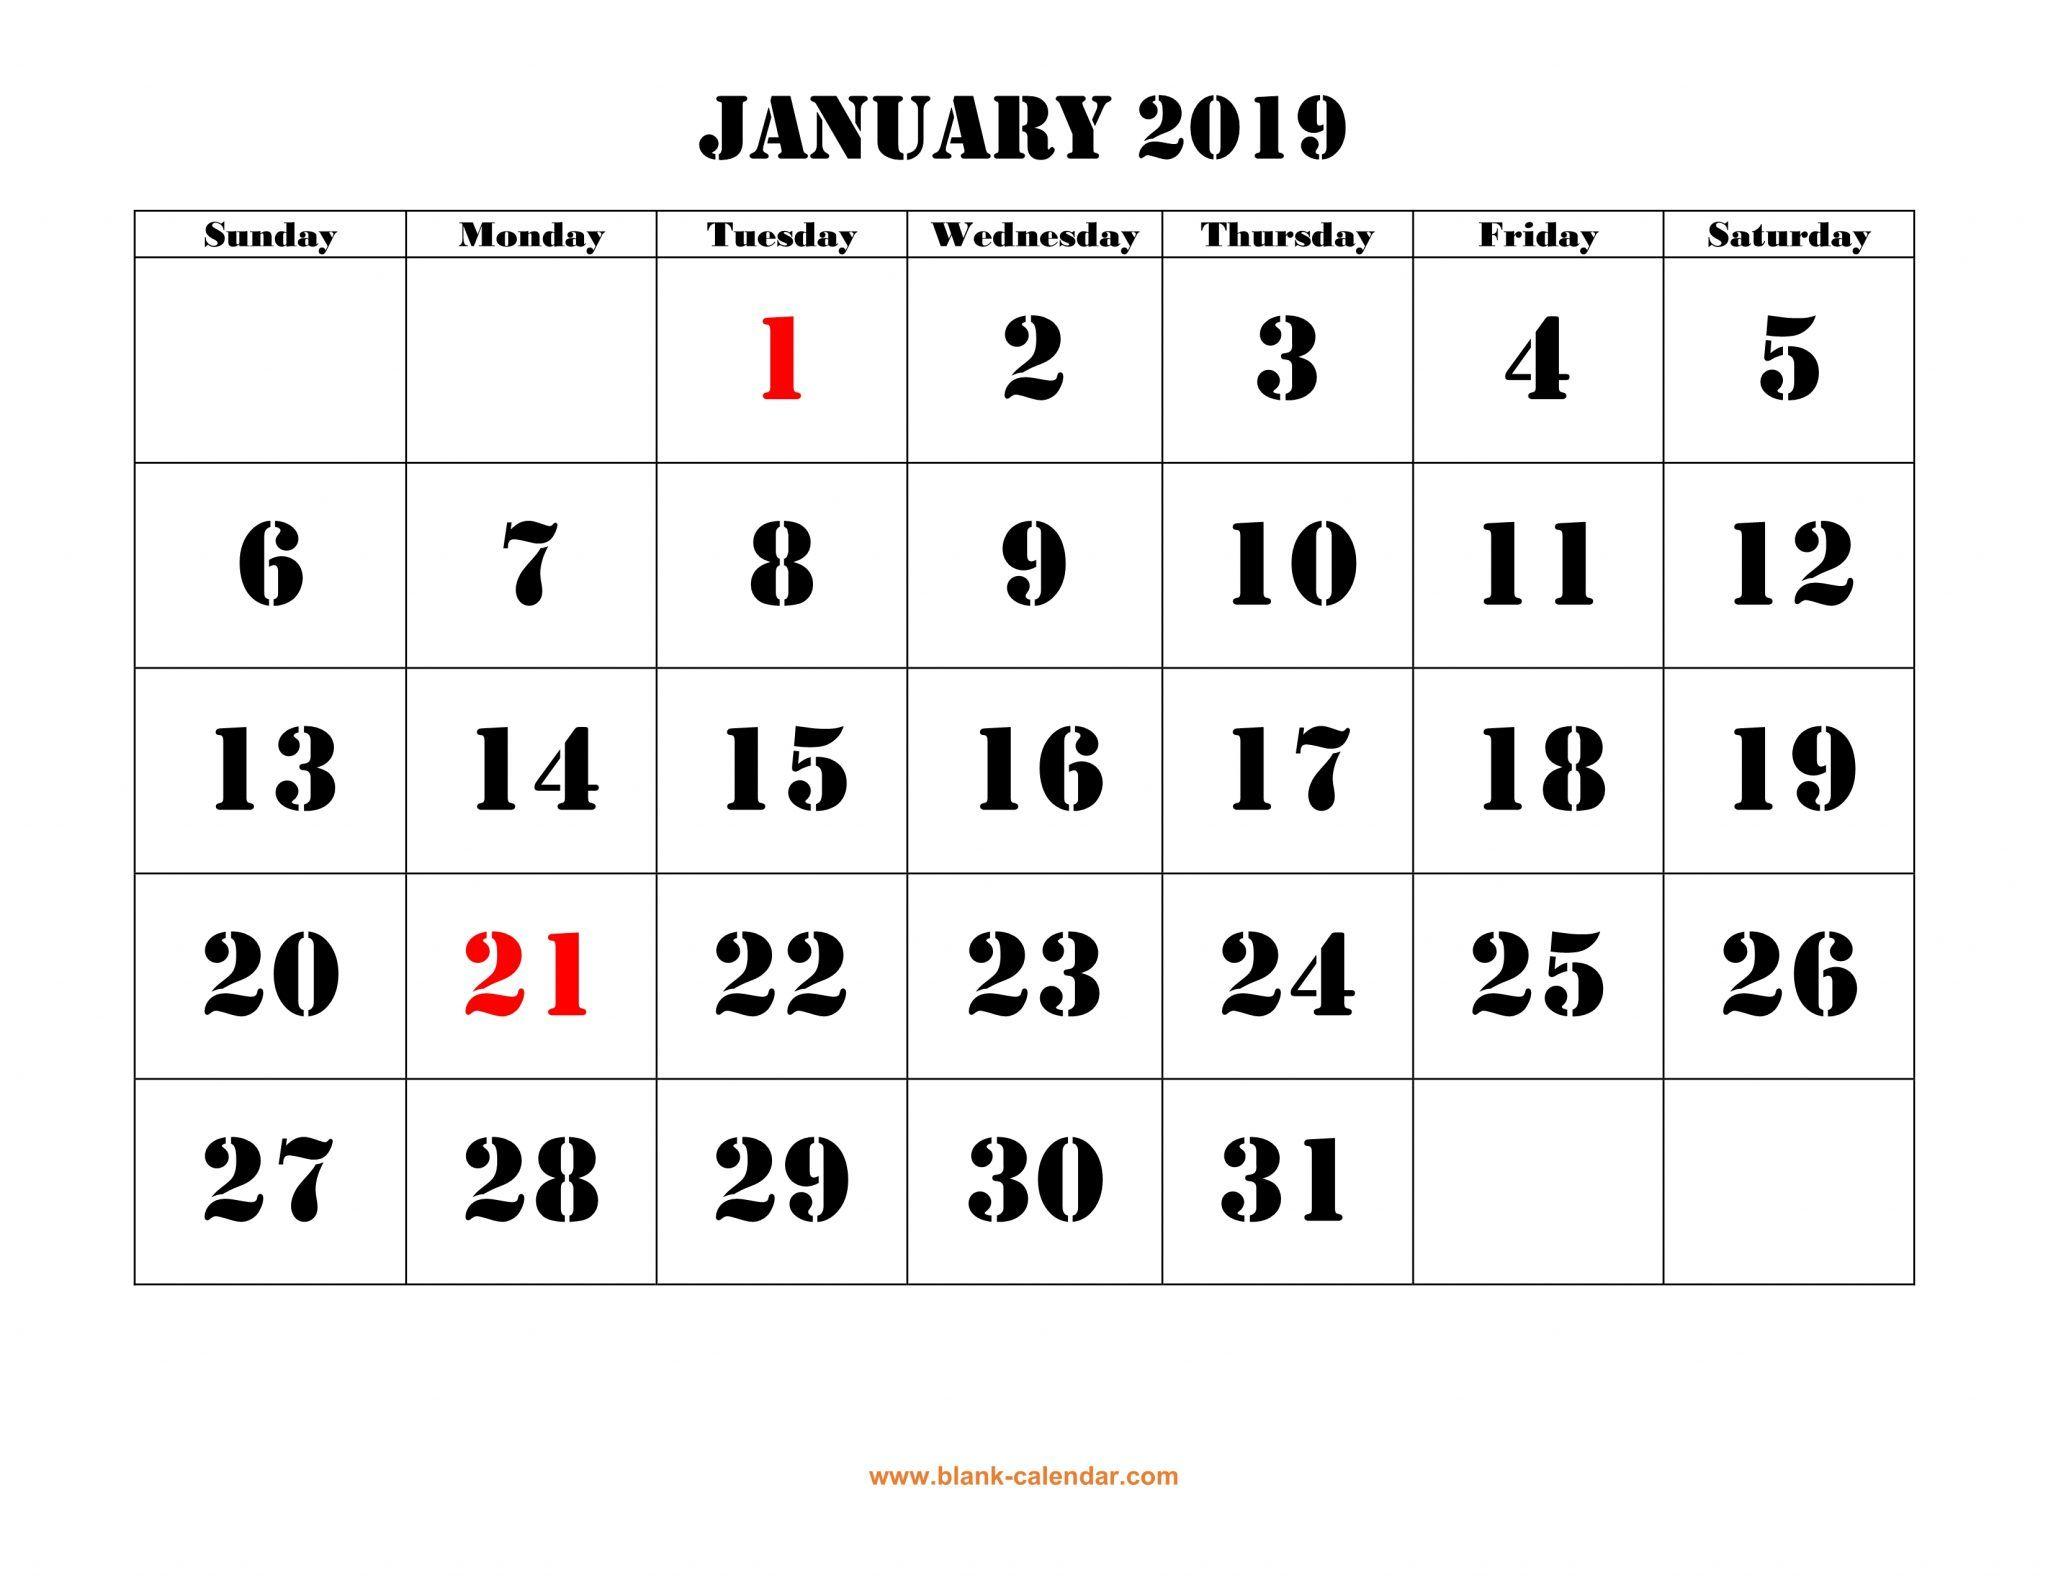 January 2019 Calendar Philippines | January 2019 Calendar